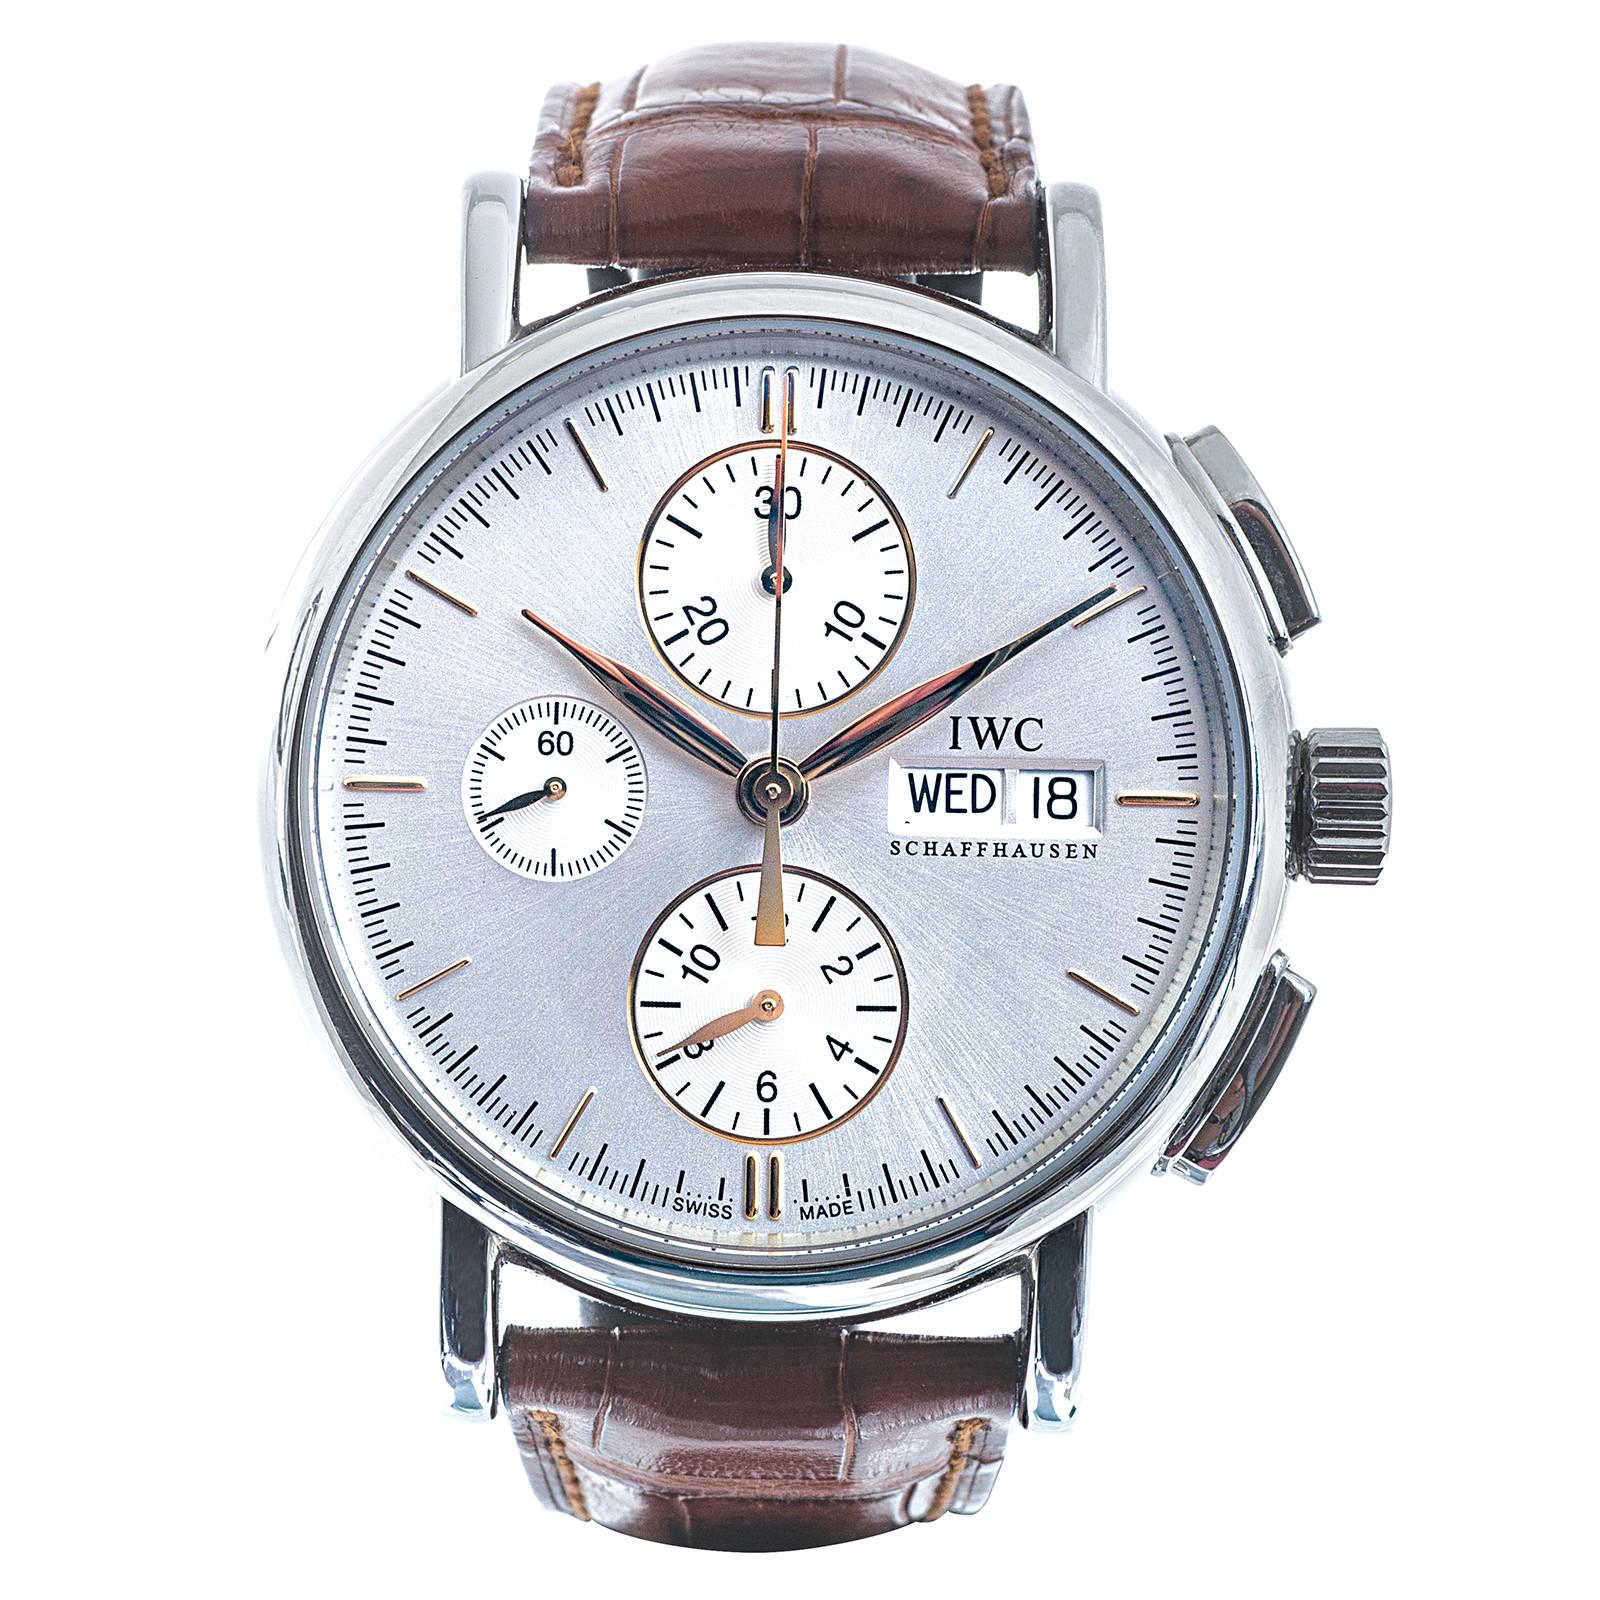 Pre-Owned IWC Portofino Chronograph